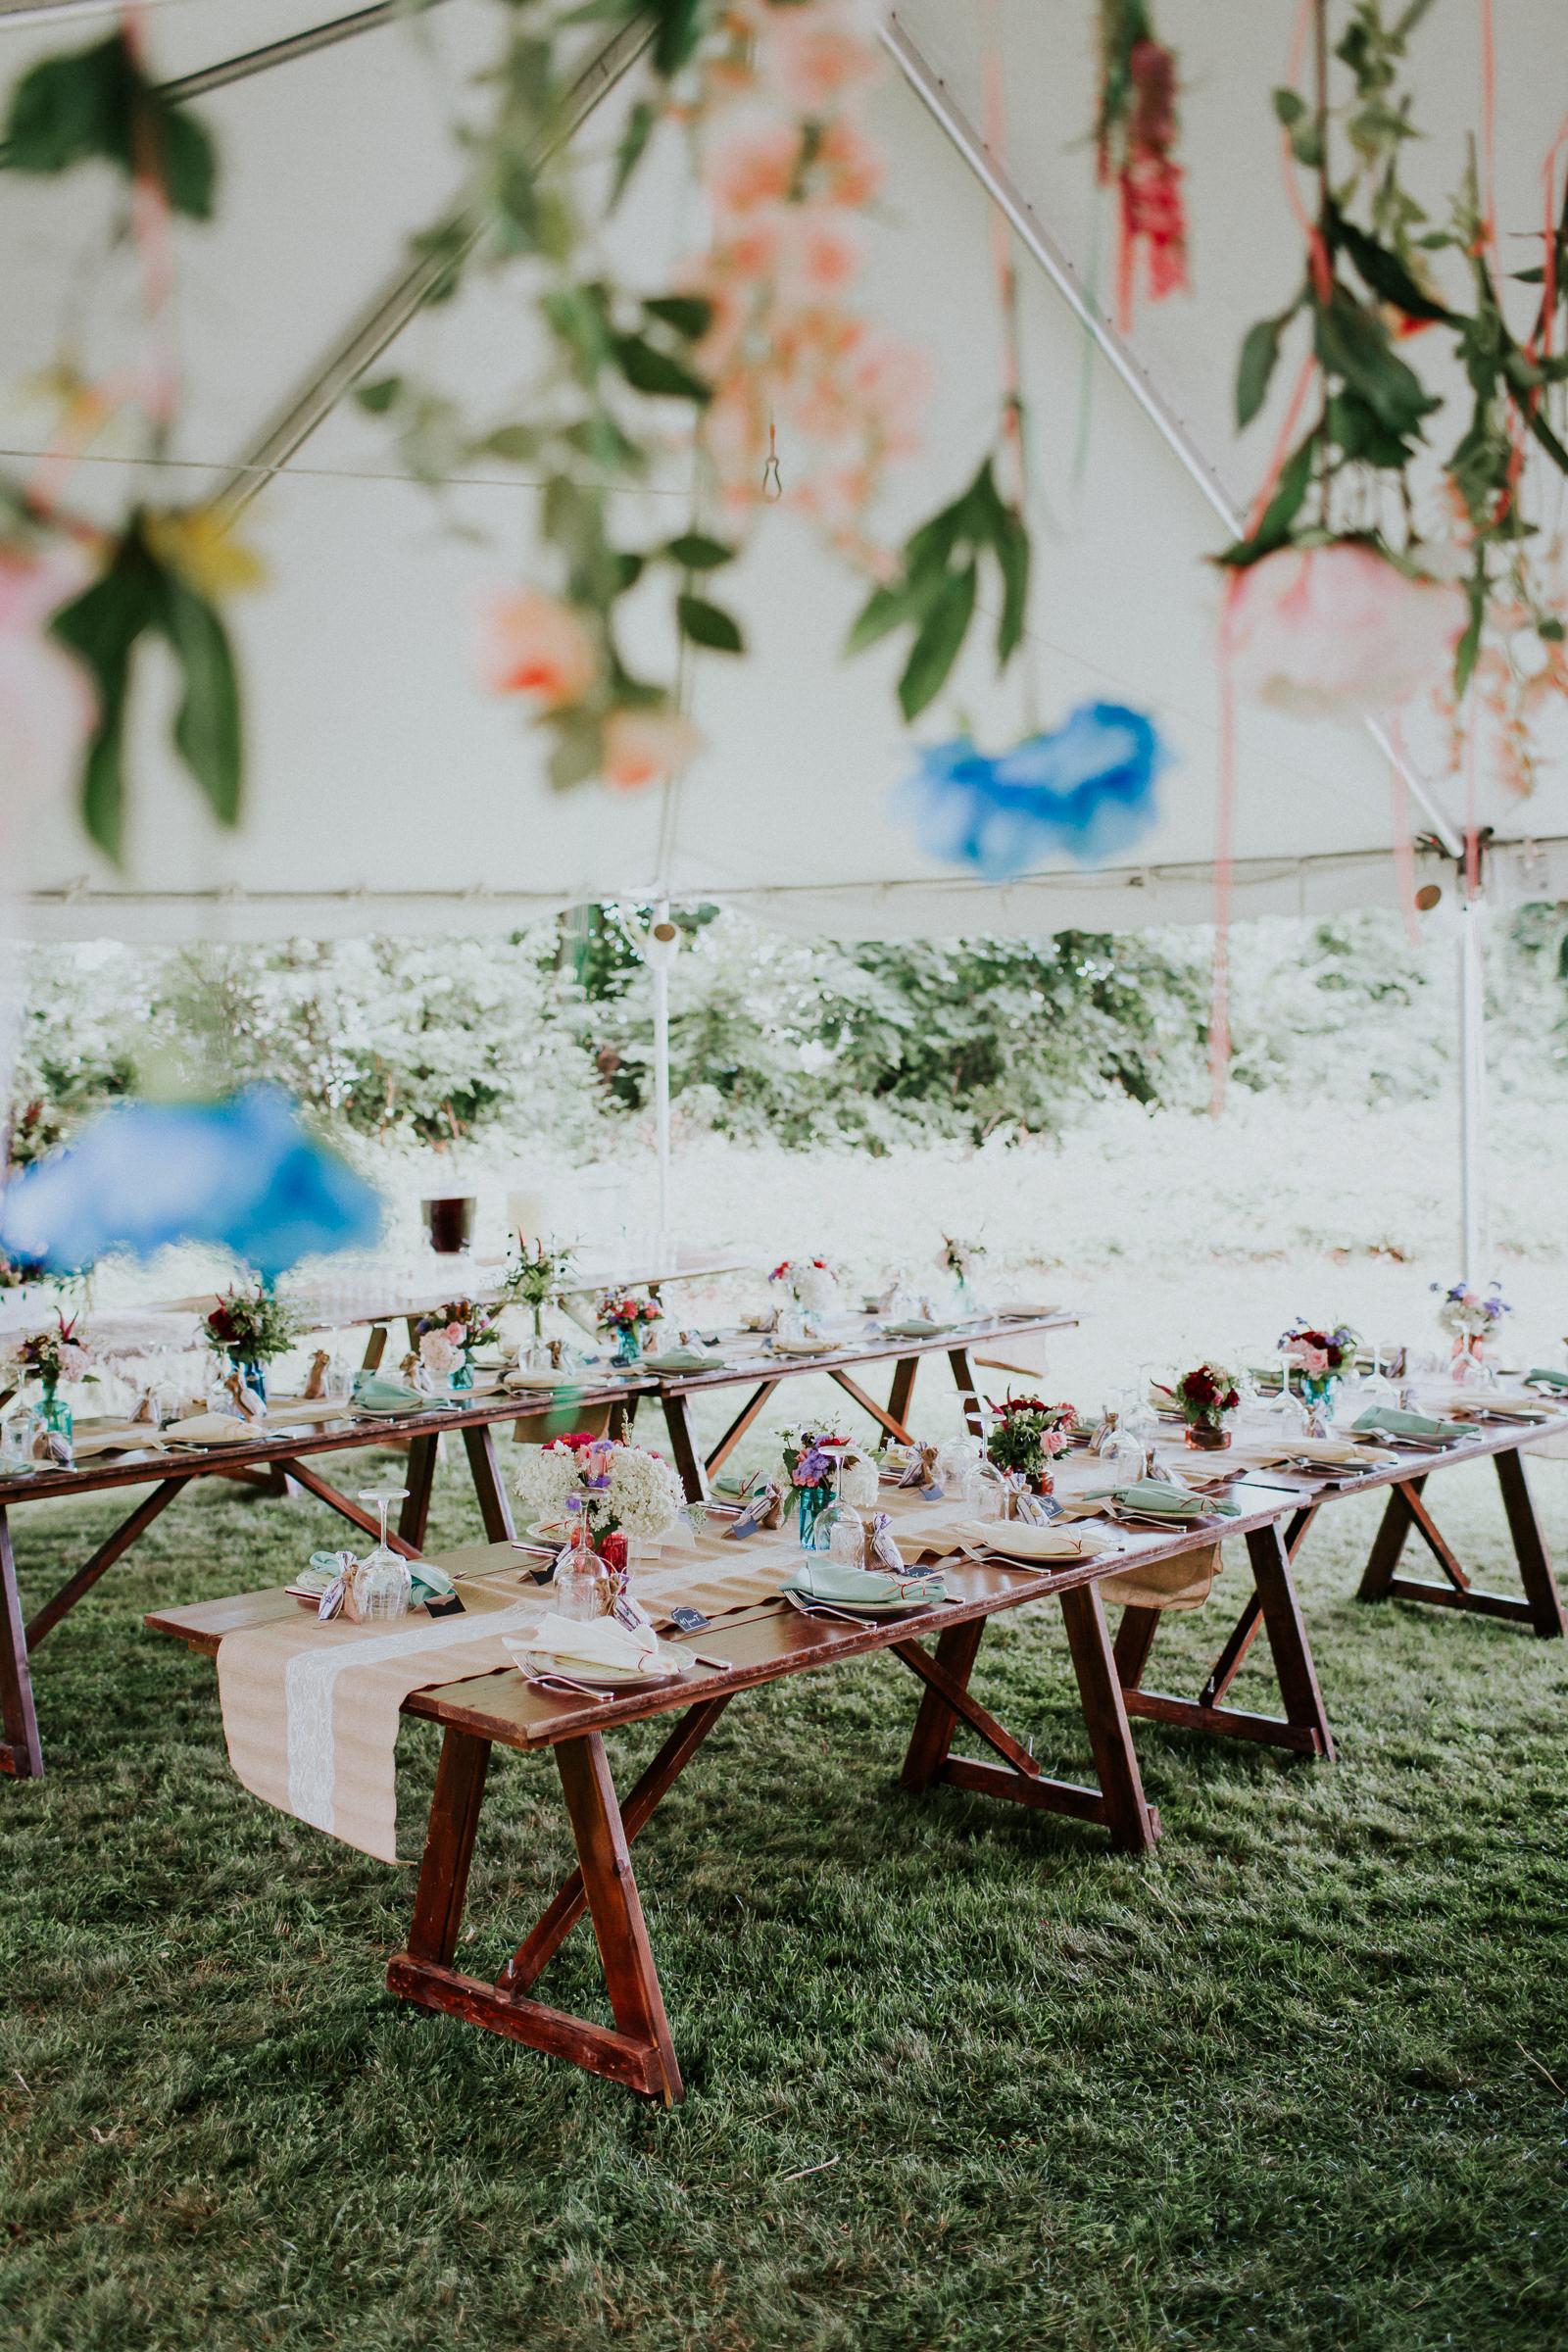 Backyard-Intimate-Adventurous-Destination-Wedding-Darien-Connecticut-Documentary-Wedding-Photography-39.jpg